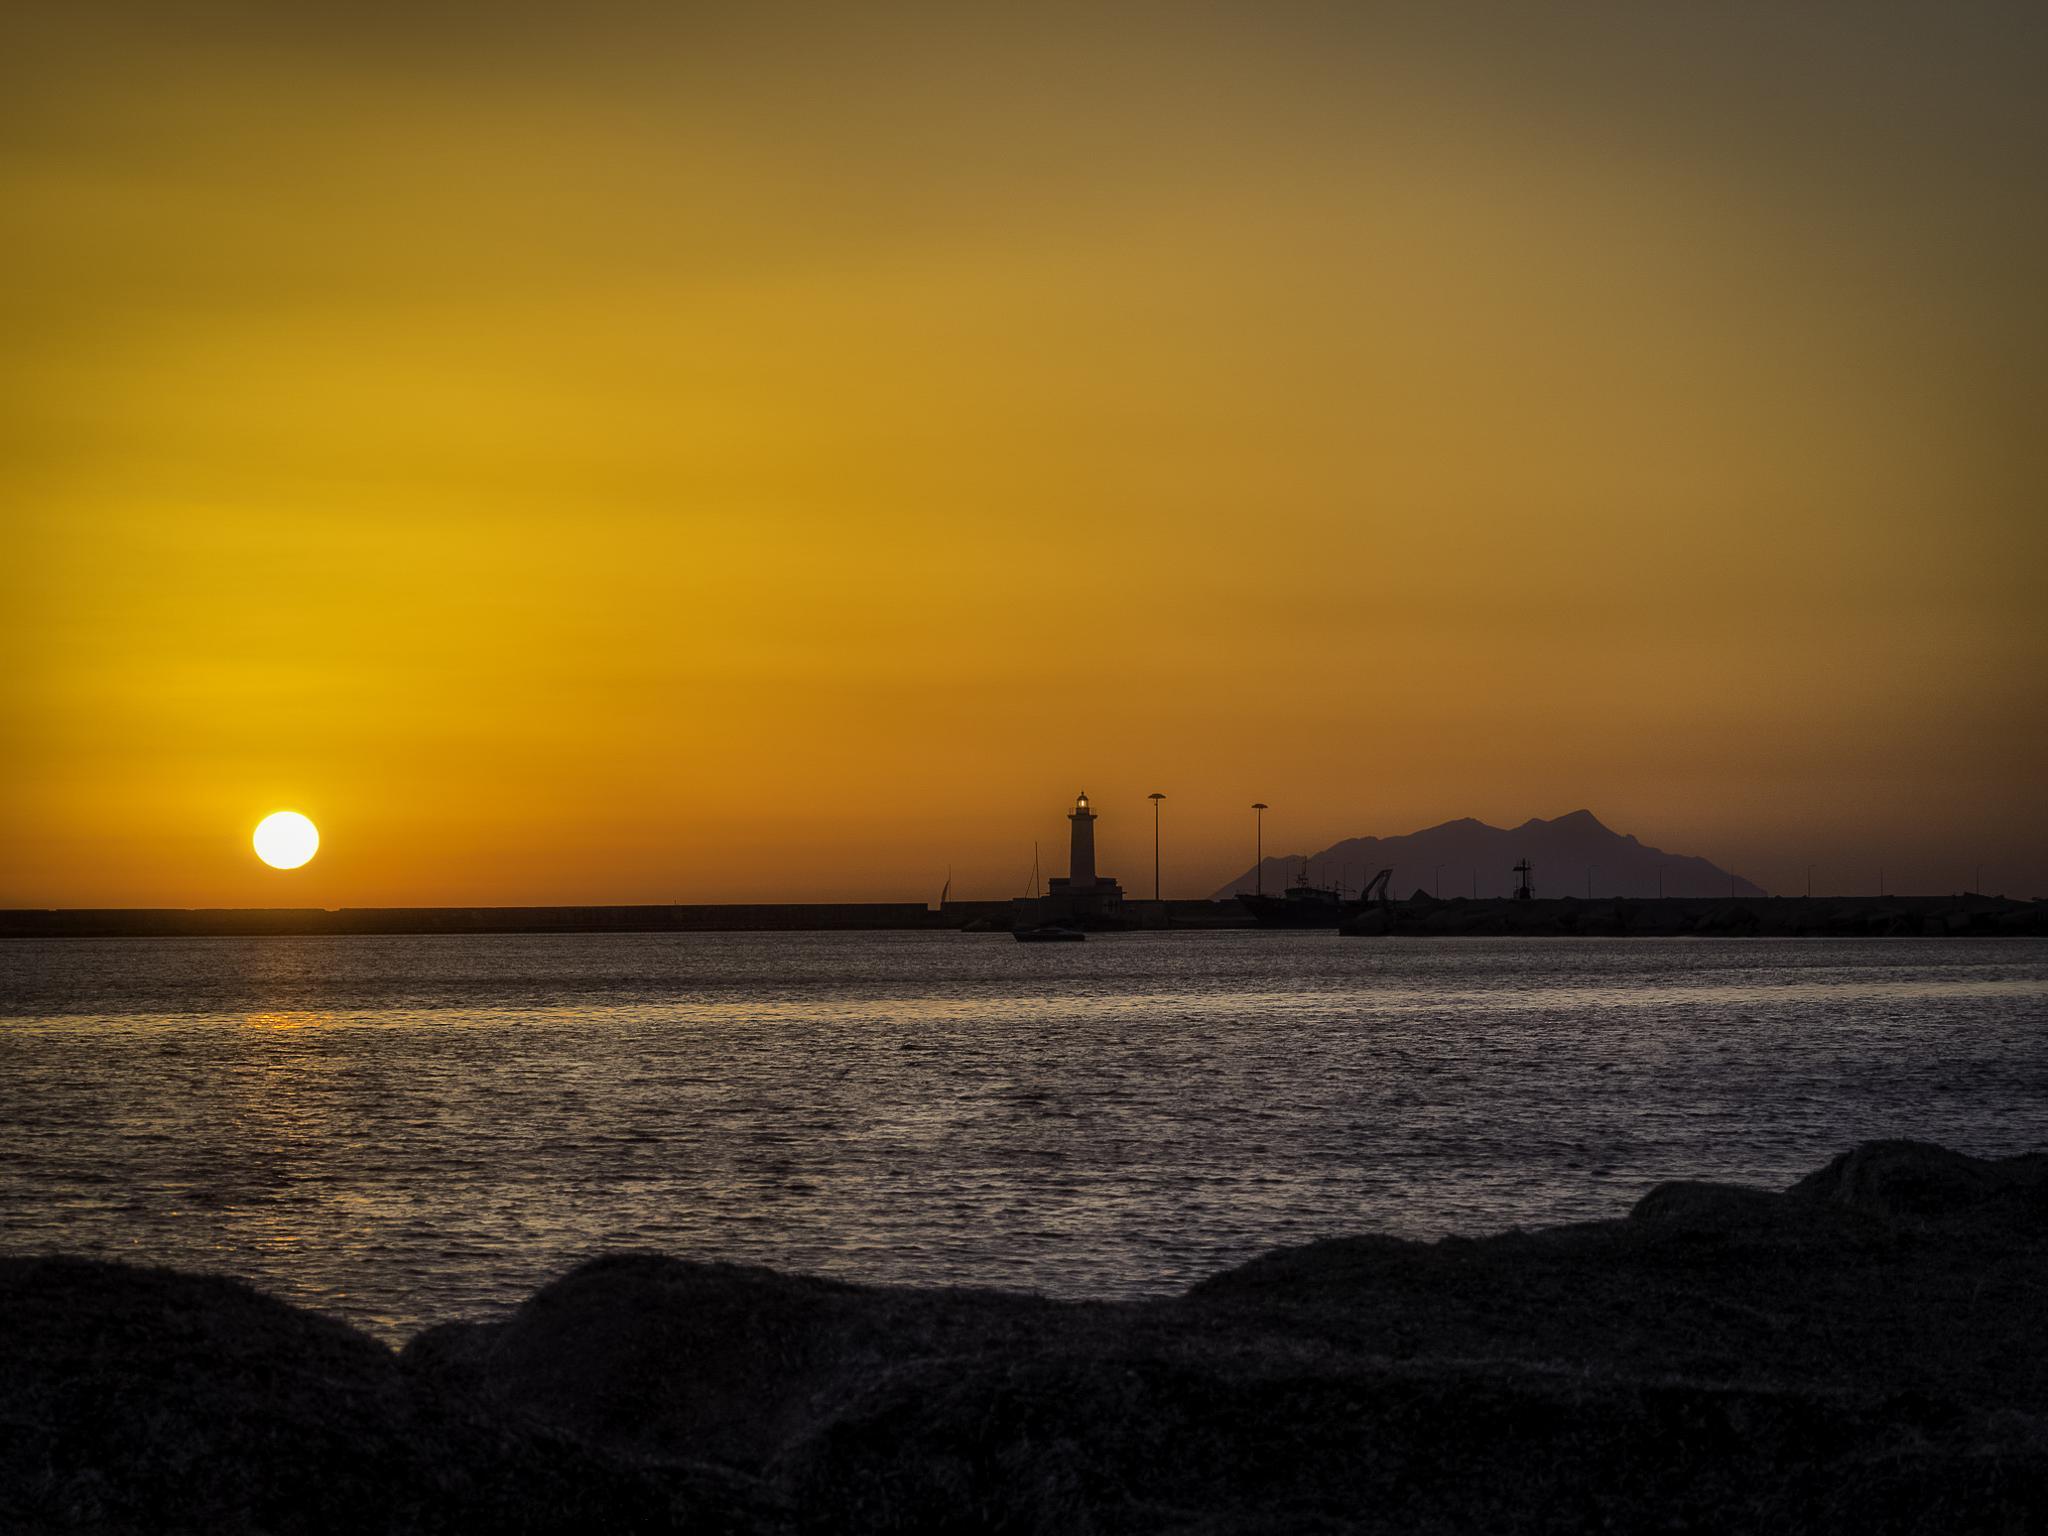 tramonto mazarese by carmelodimaria3